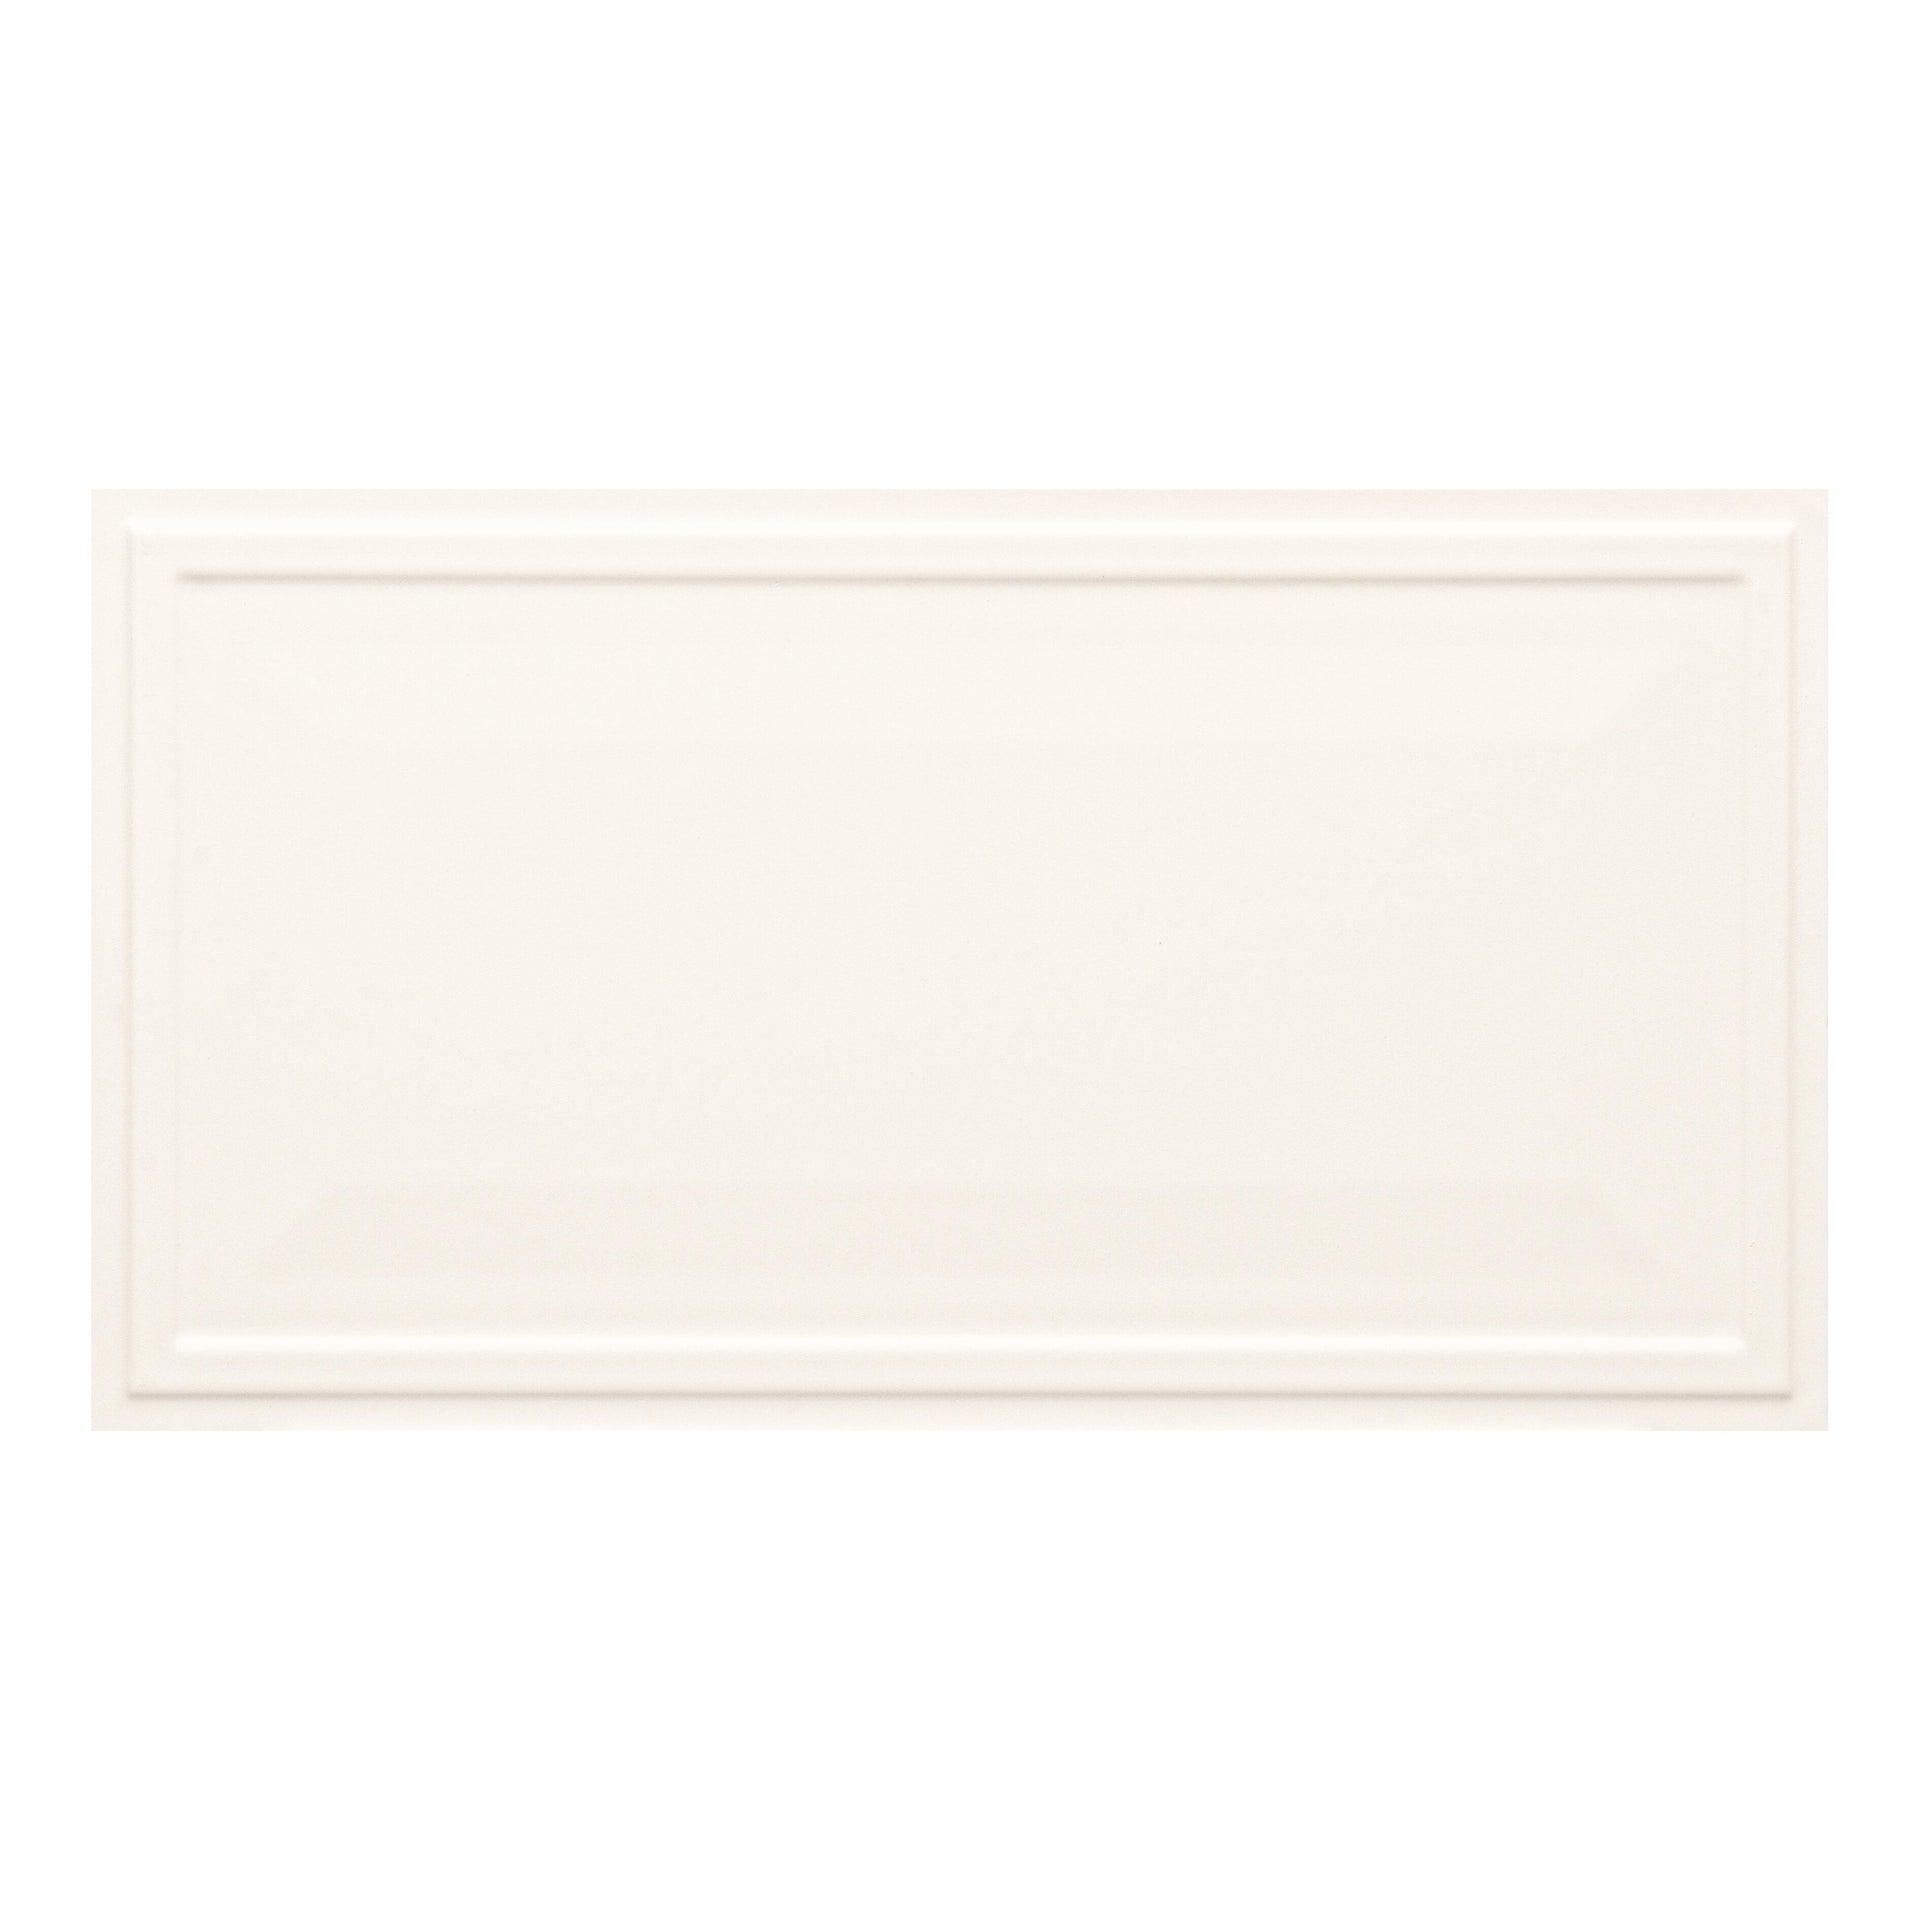 Piastrella per rivestimenti New Classic 30 x 56 cm sp. 10 mm bianco - 8